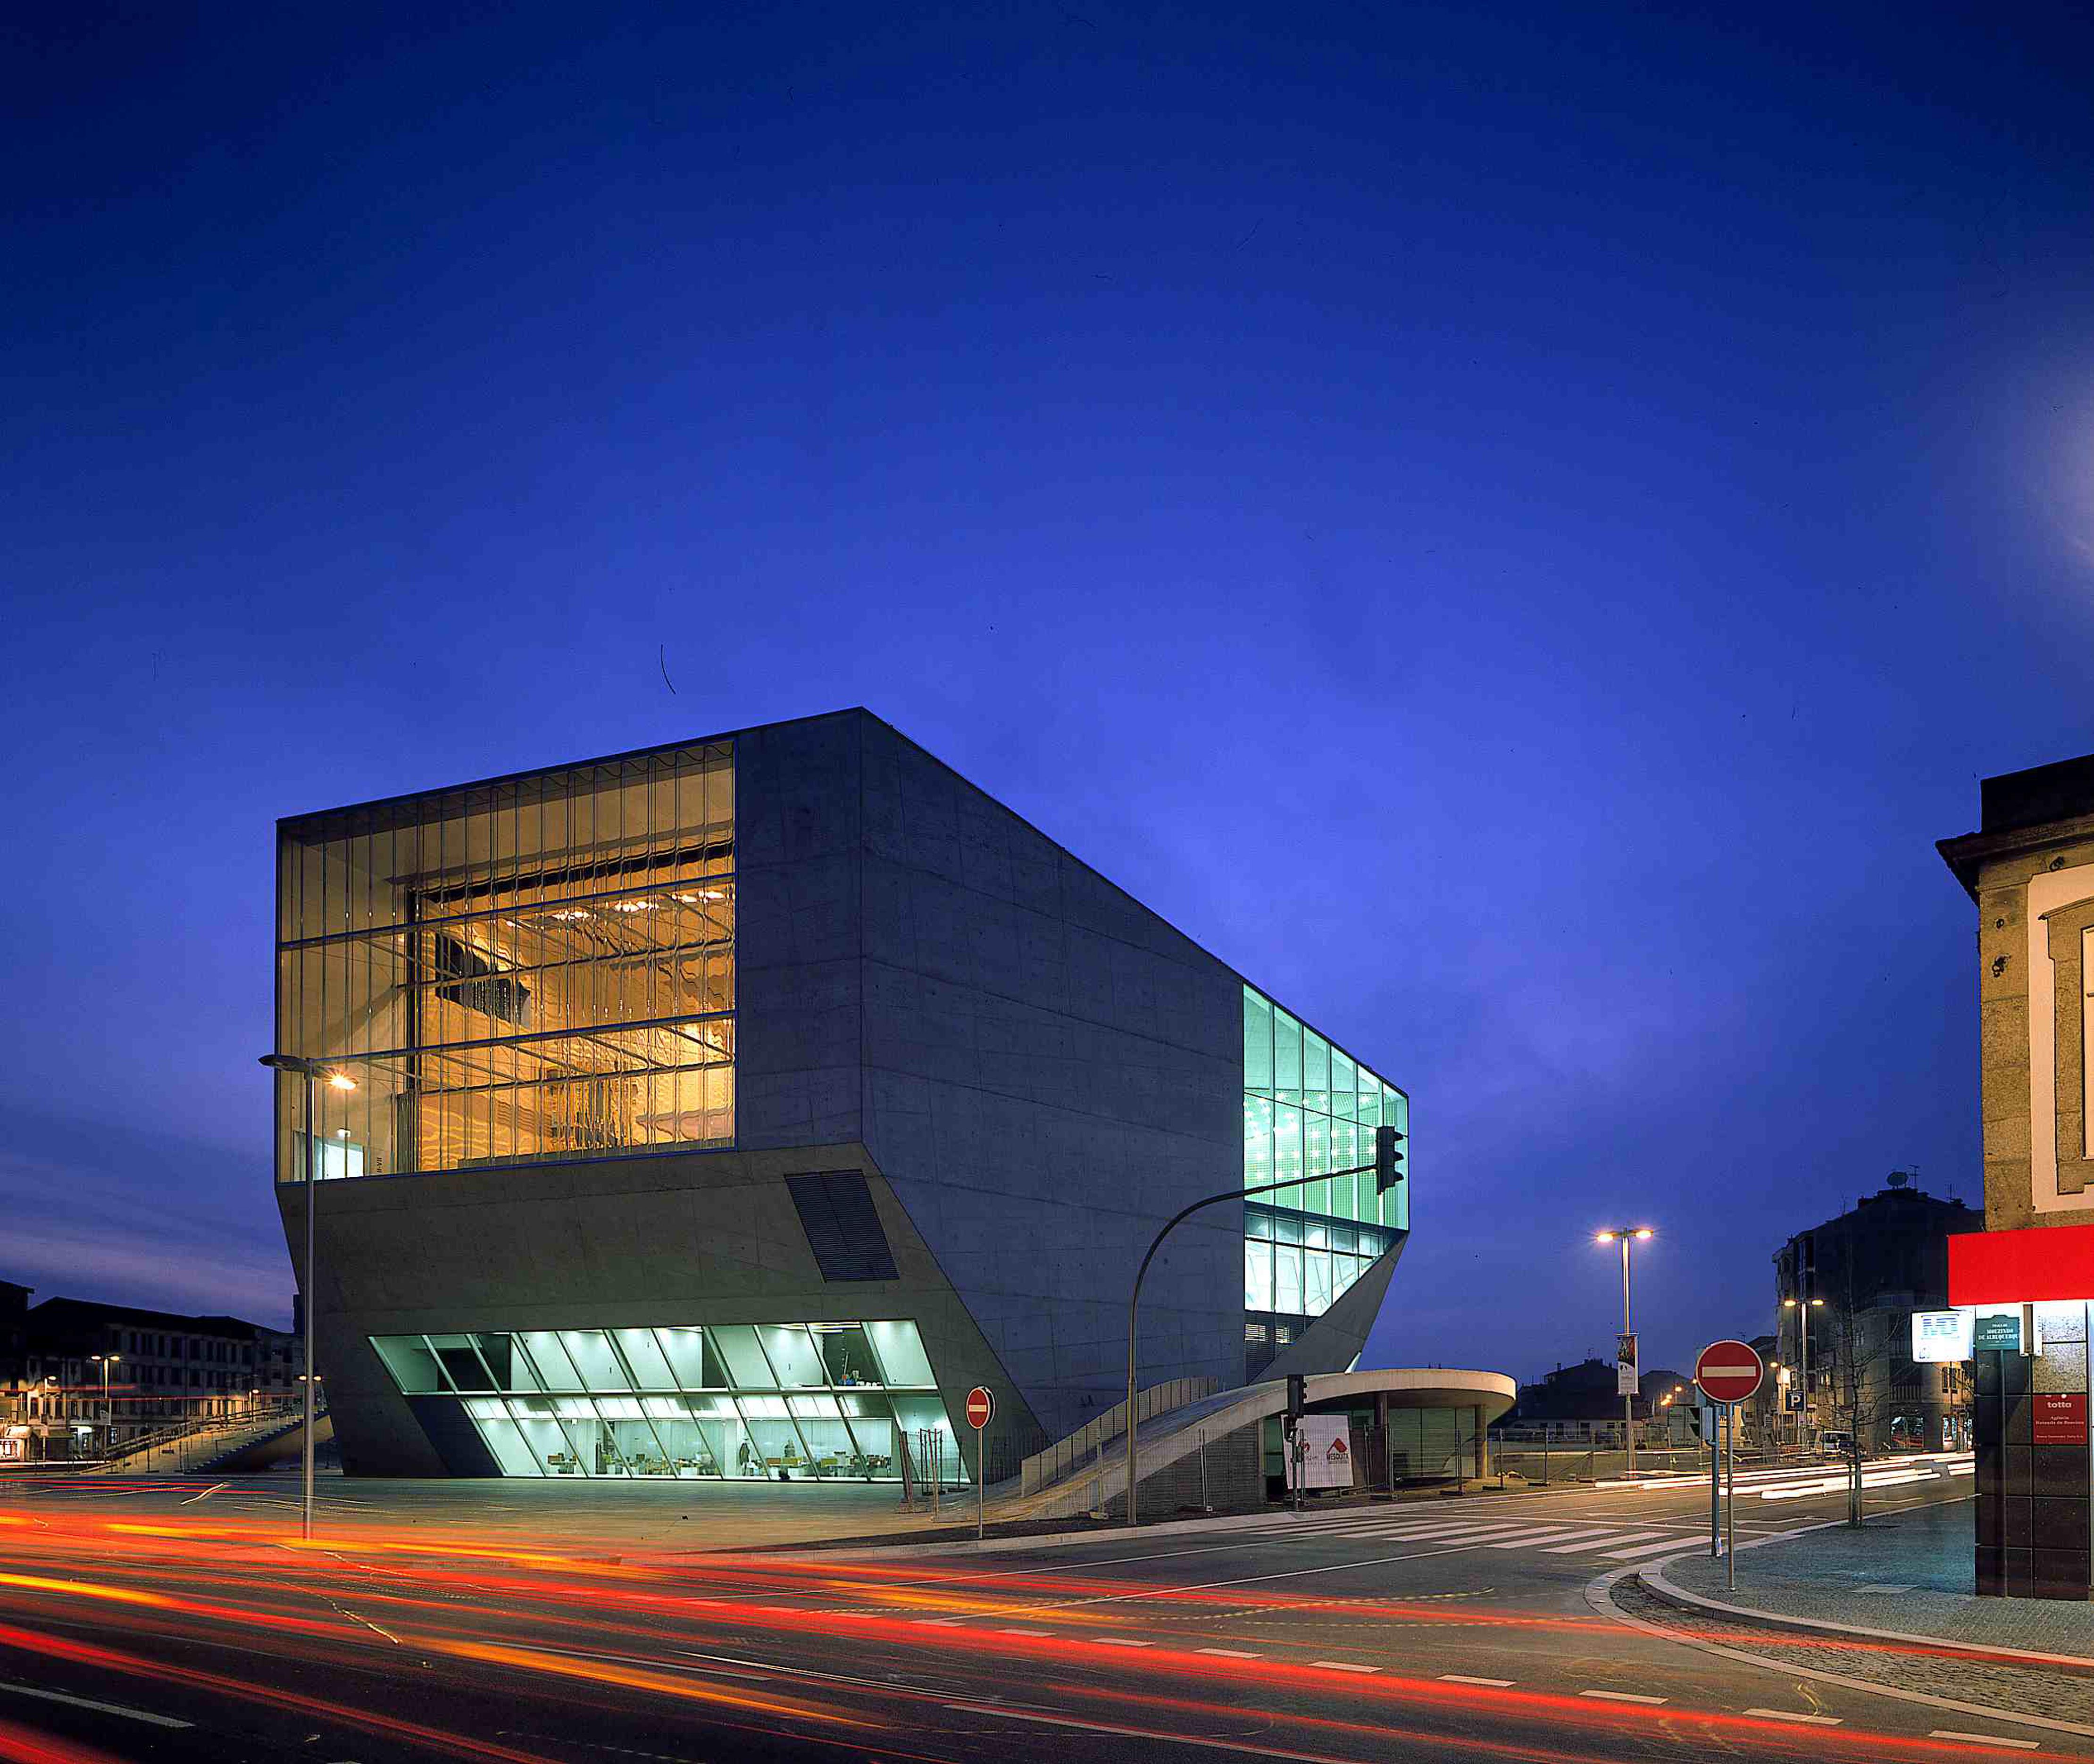 Casa De Musica Hotel Porto